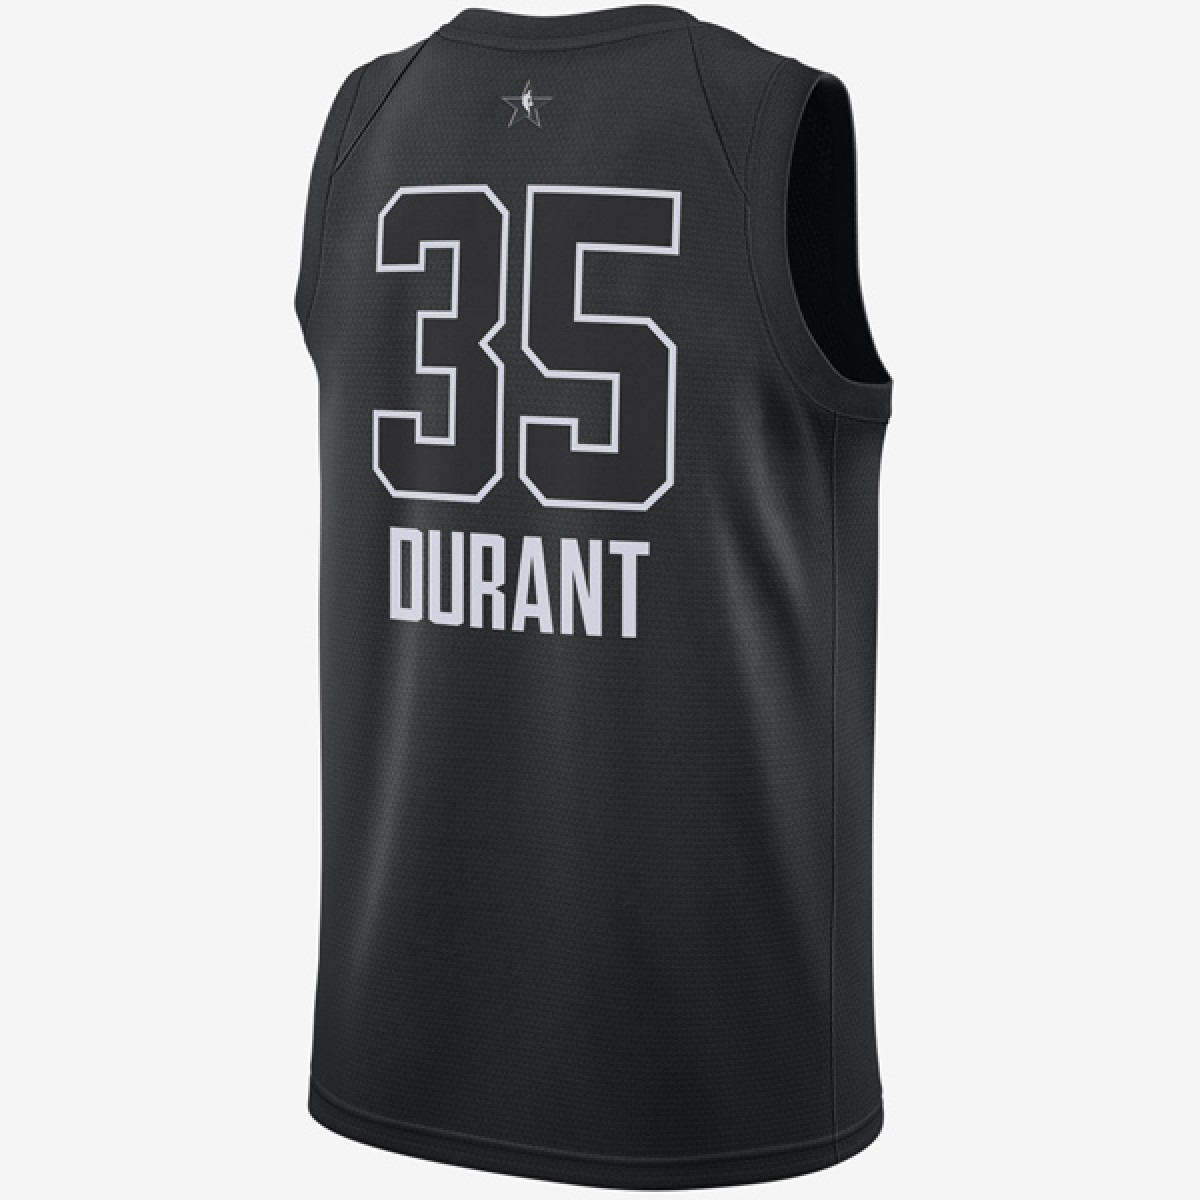 Jordan Swigman Jersey All-Star edition Durant 'Black' 928873-012